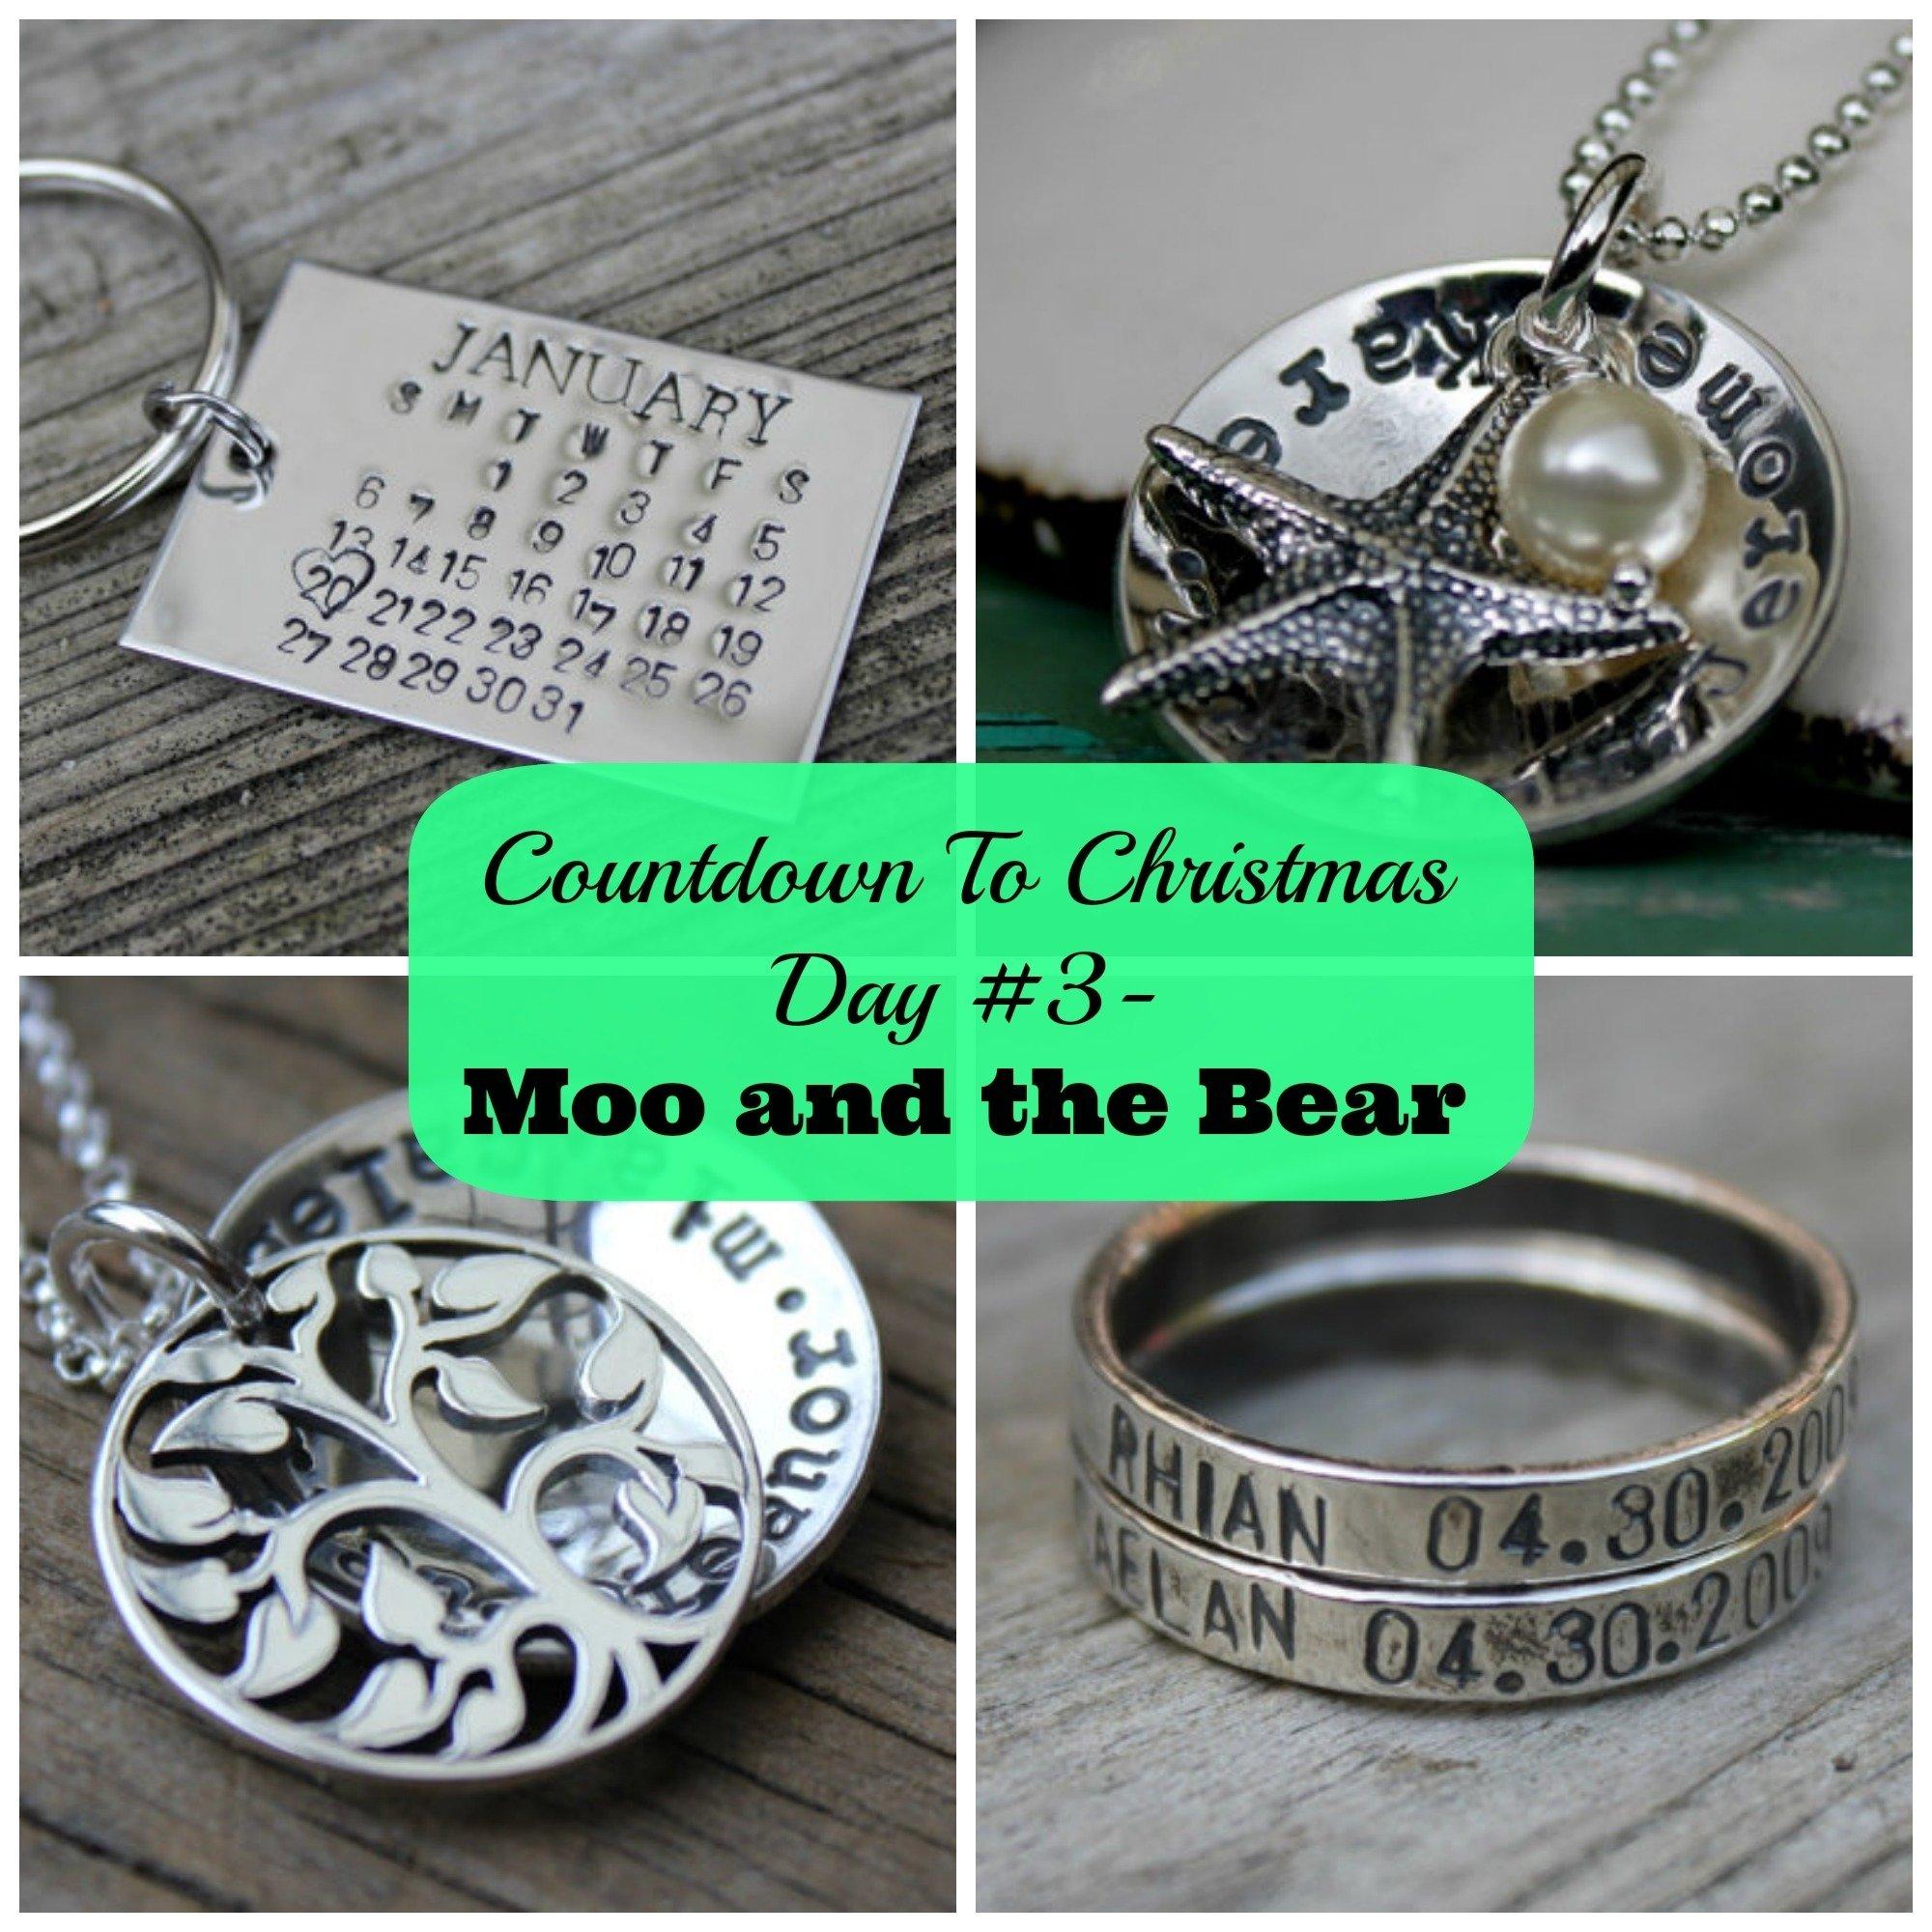 10 Most Popular Xmas Gift Ideas For Boyfriend gift ideas for boyfriend free gift ideas for boyfriend christmas 1 2021